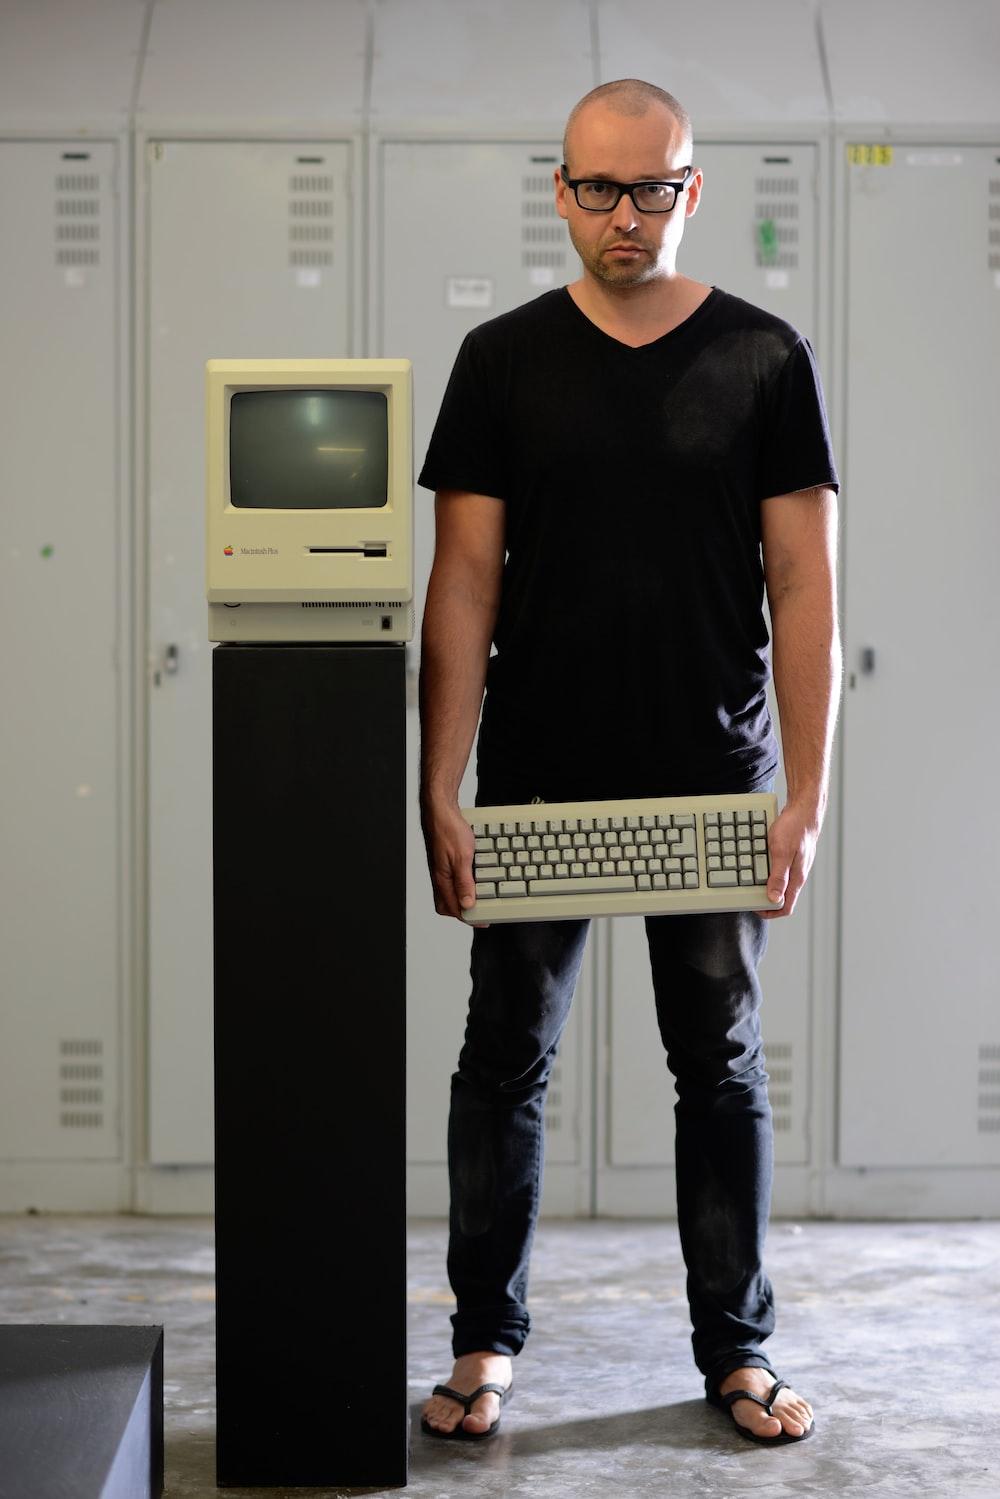 man in black shirt holding computer keyboard